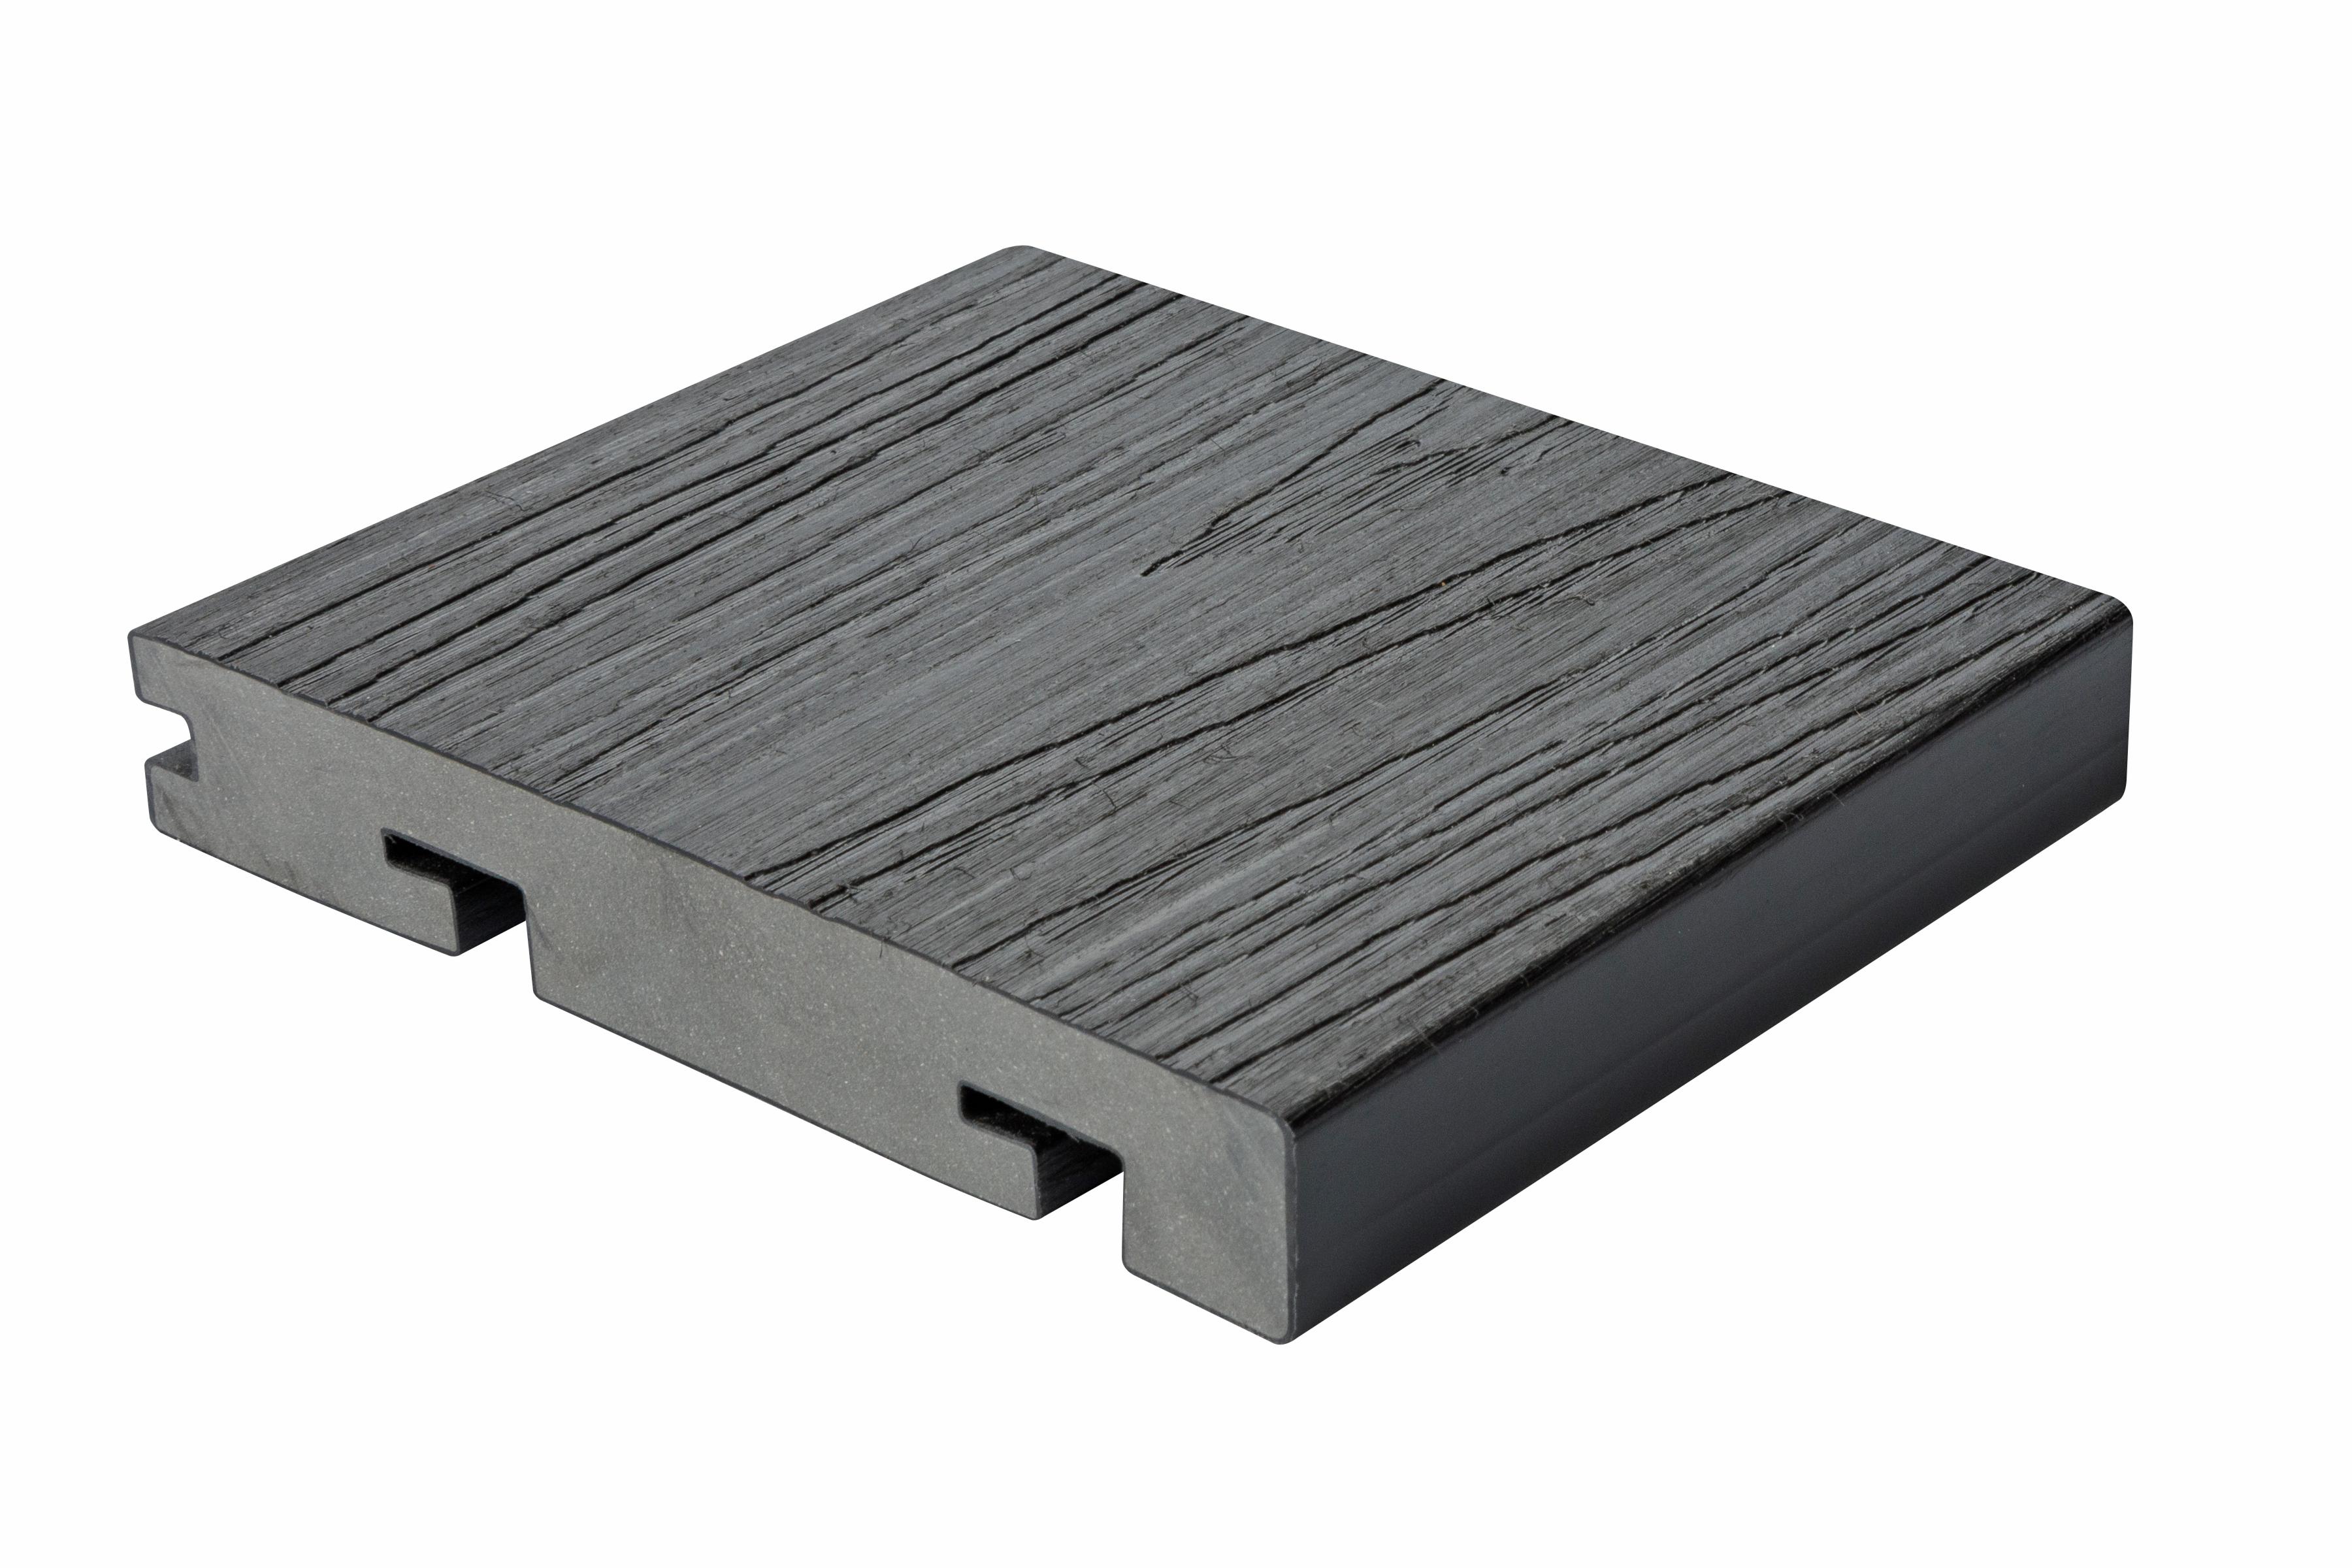 HD Deck Dual Bullnose Carbon 22.5xx x 150mm x 3600mm